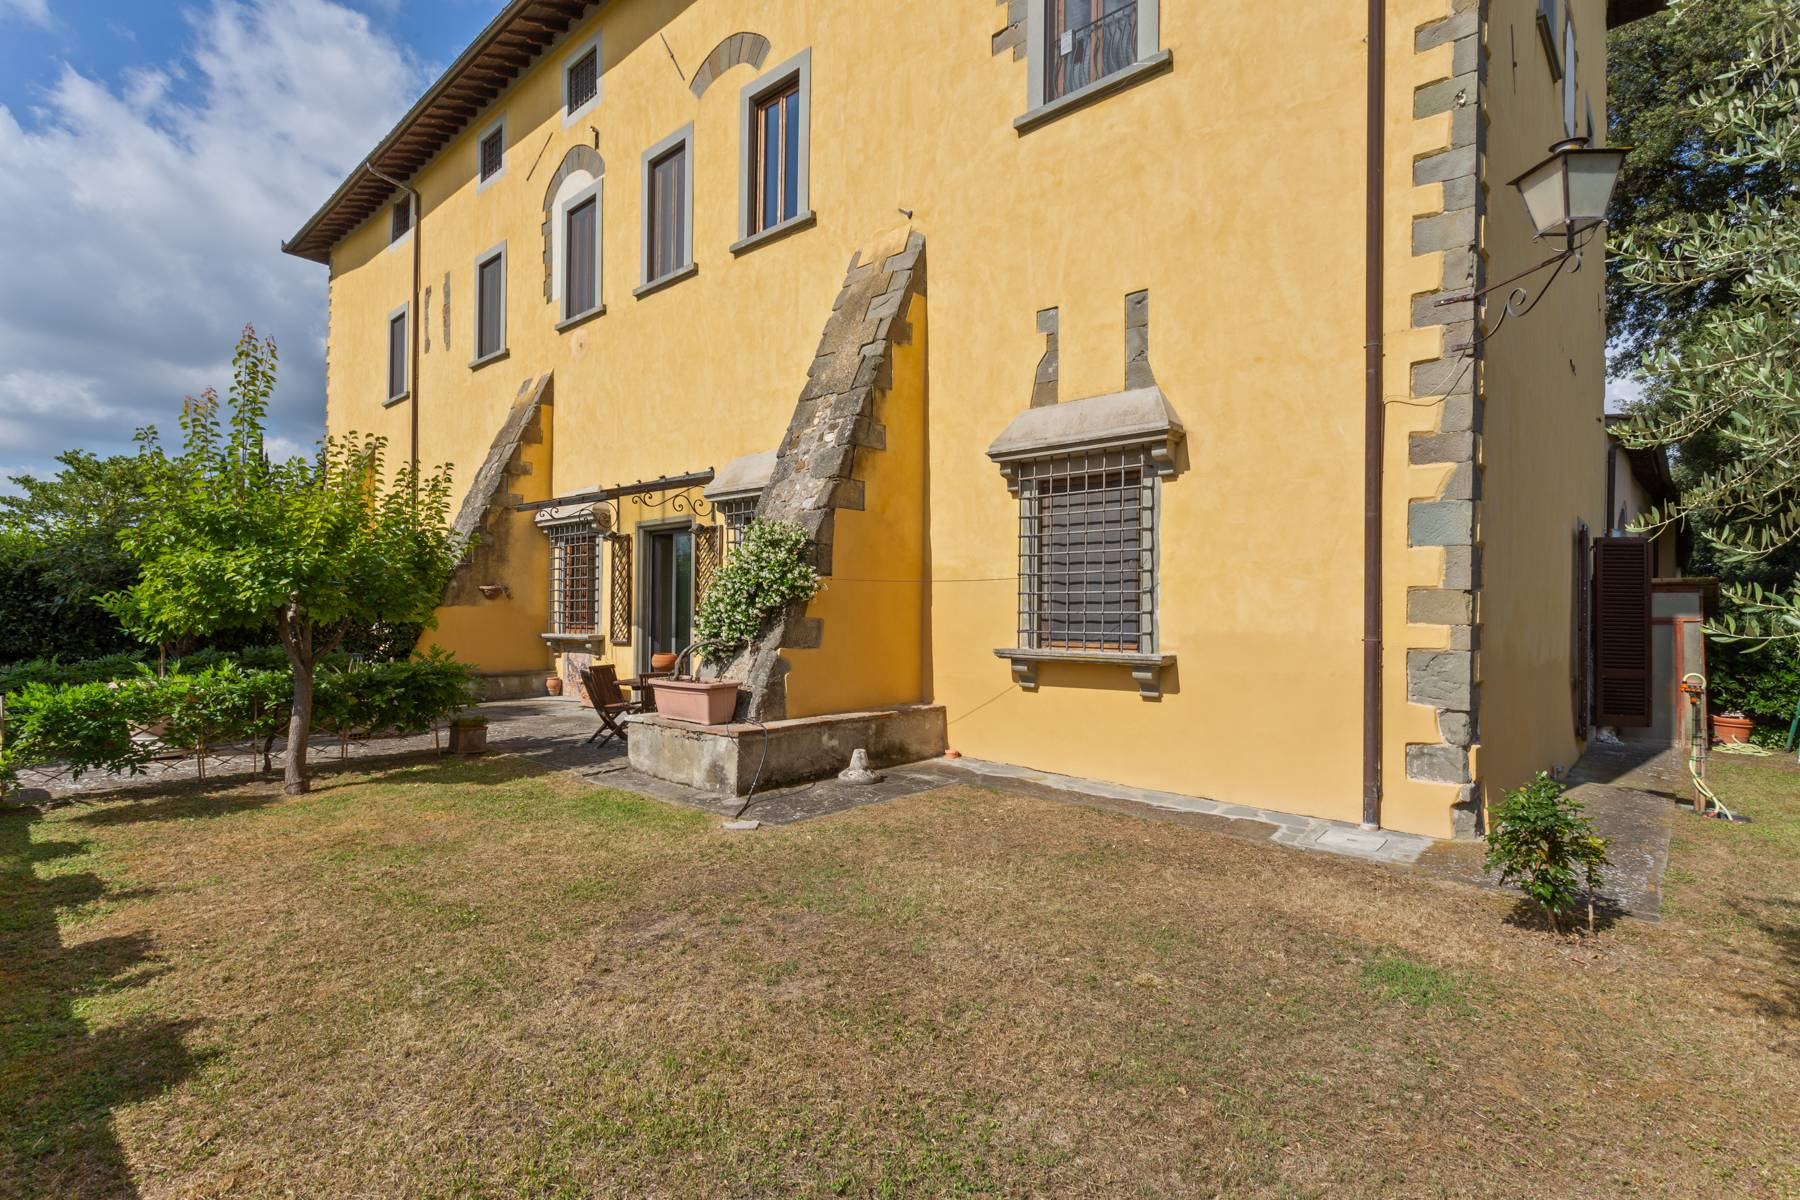 Appartamento in Vendita a Scandicci: 5 locali, 140 mq - Foto 11